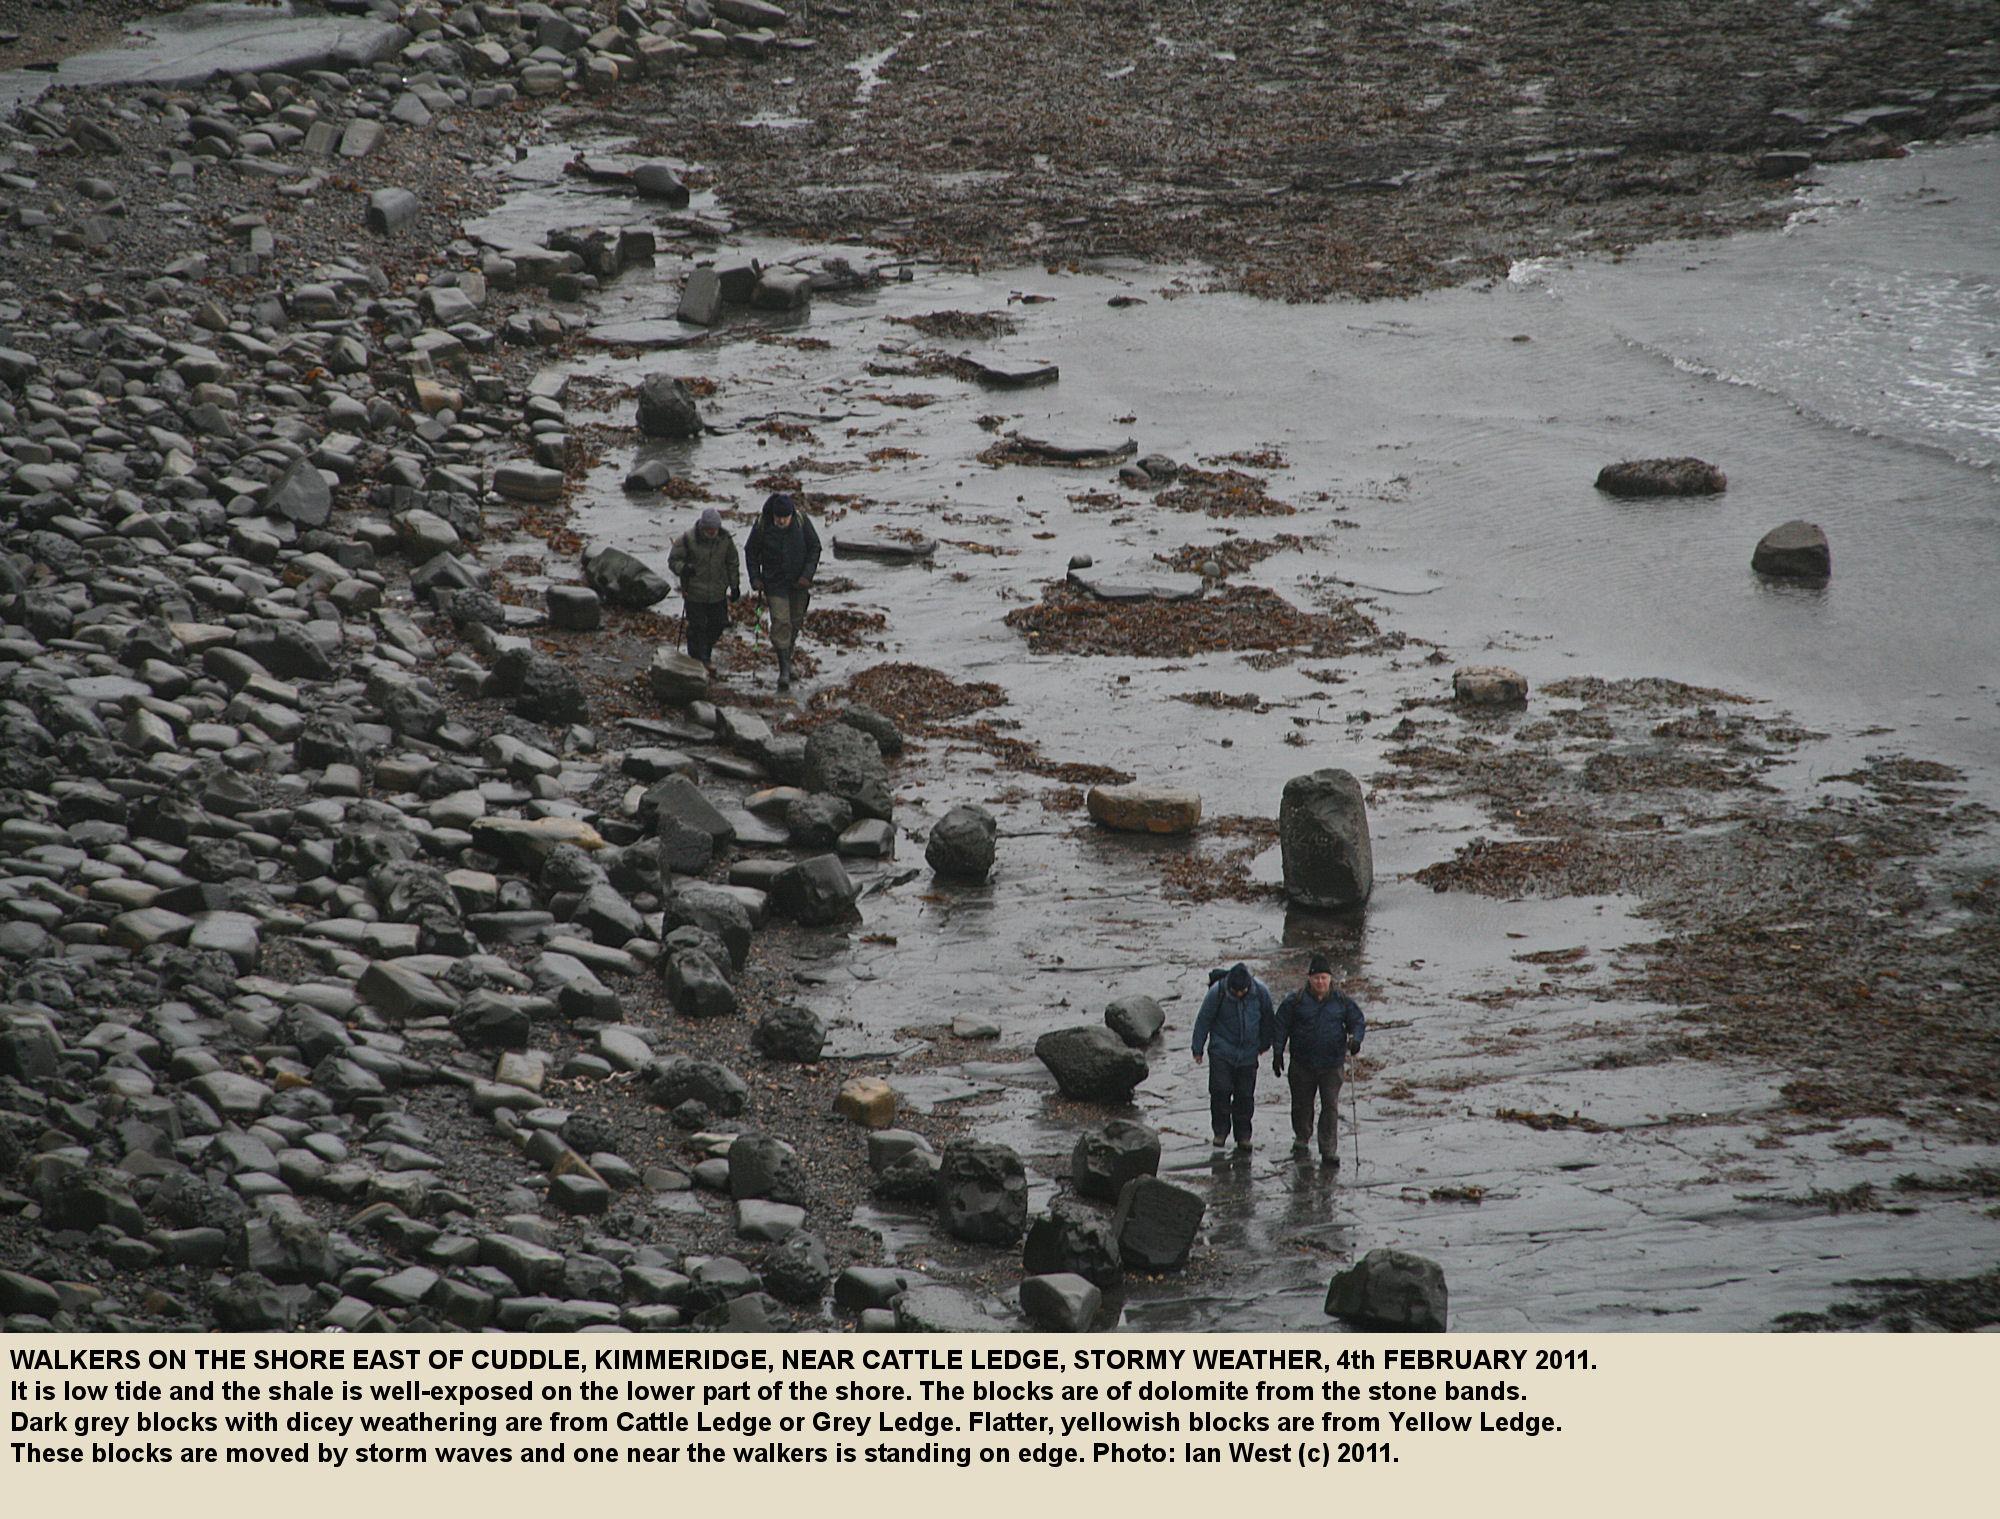 Aquarium Unterschrank Ikea Expedit ~ Walkers on the shore east of Cuddle Kimmeridge in stormy conditions